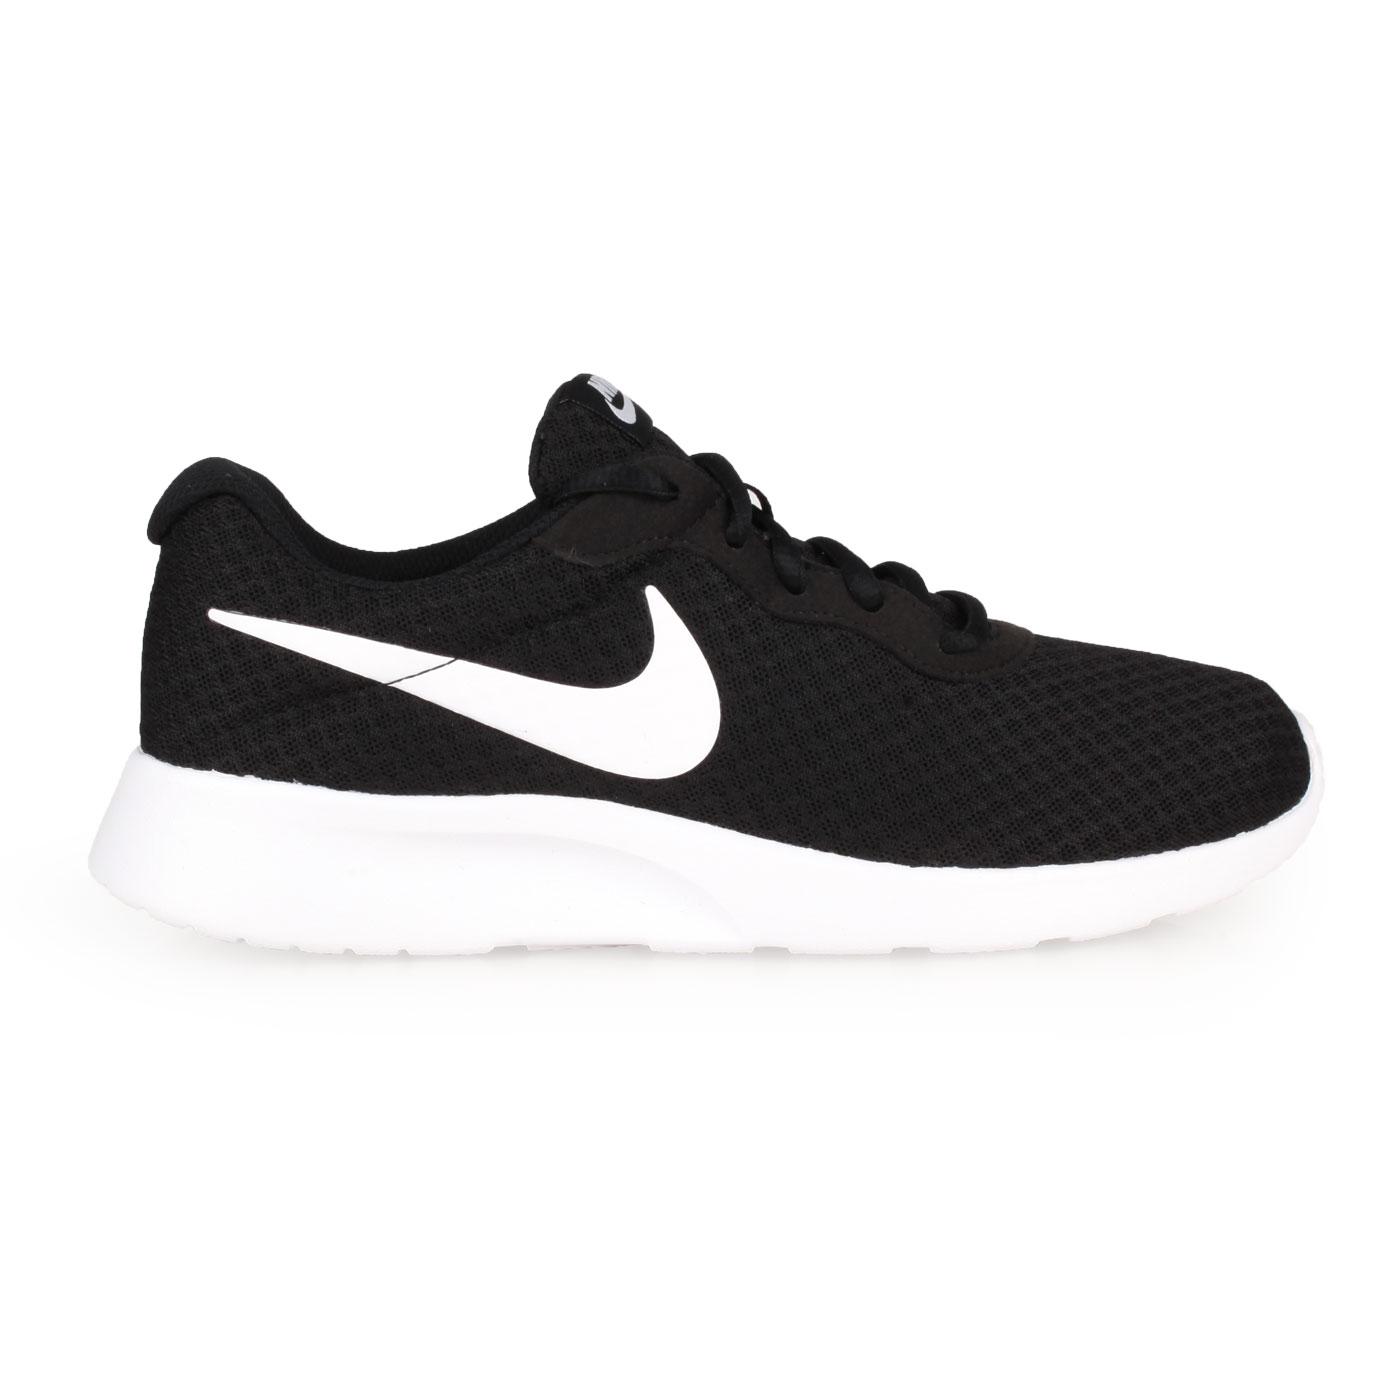 NIKE 女款休閒慢跑鞋  @WMNS TANJUN@812655011 - 黑白